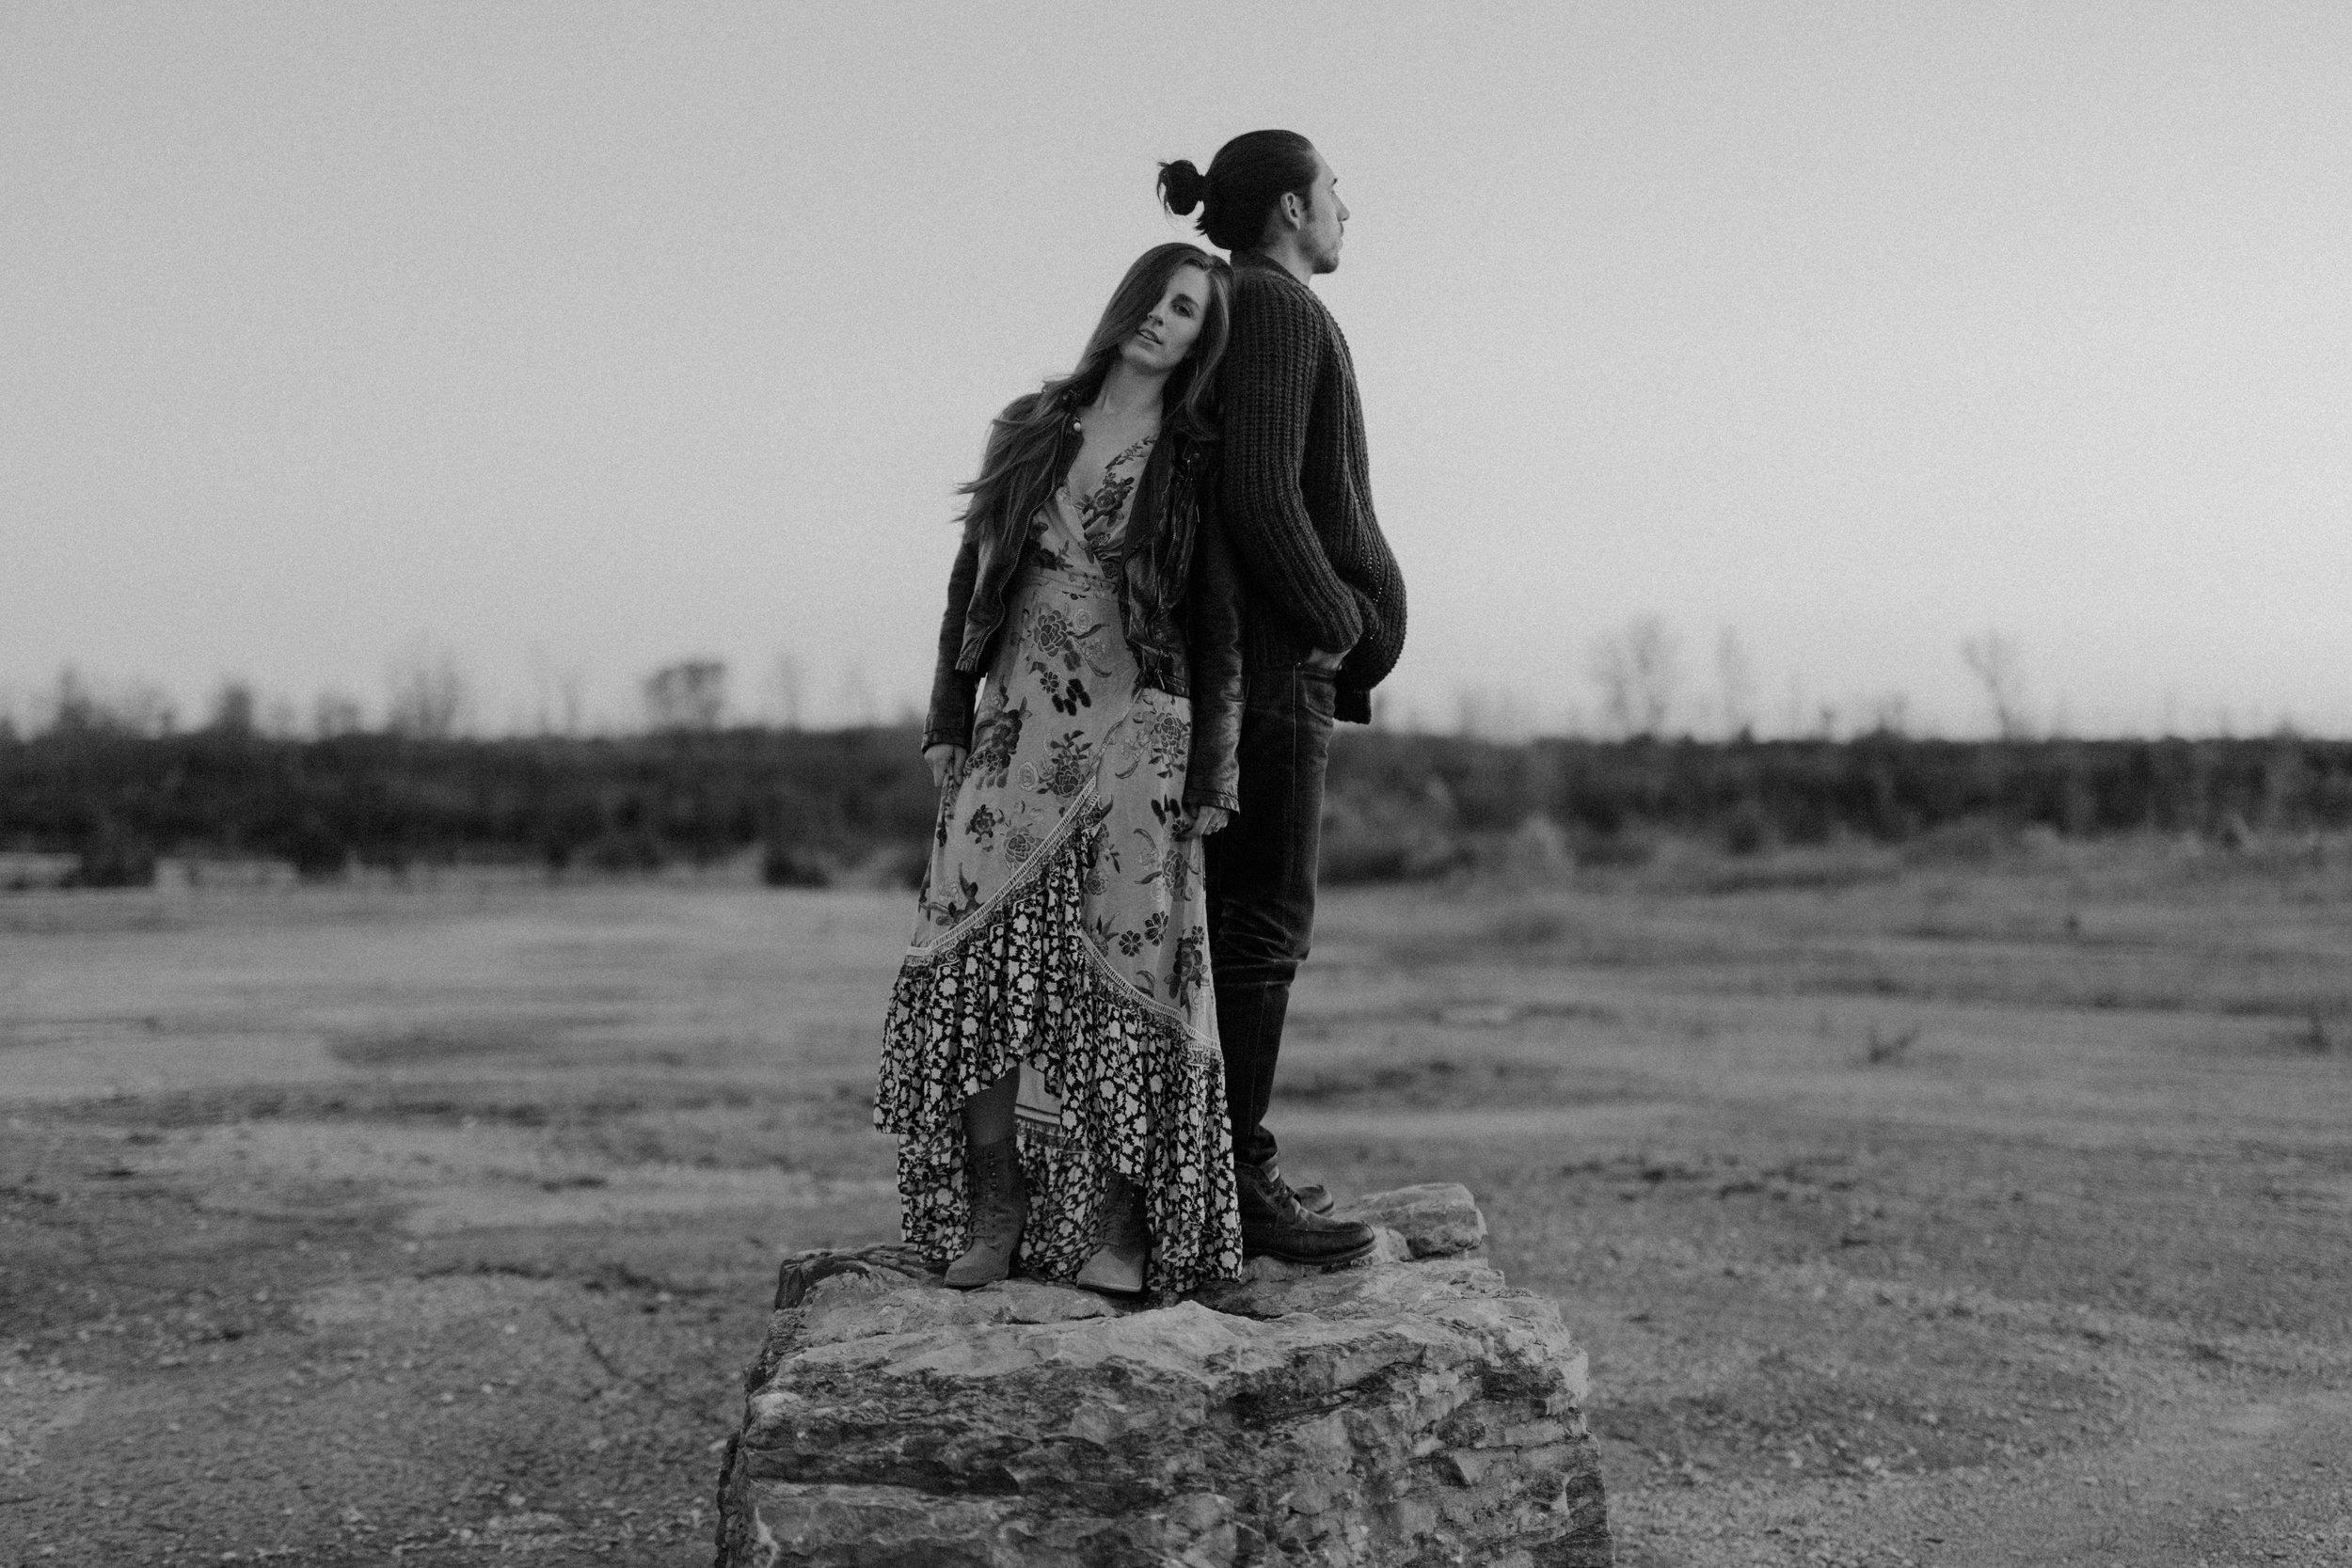 ohio engagement photographer. bohemian engagement inspiration. floral boho dress. natural light photographer. moody engagement photography. sarah rose photography. i am sarah rose.